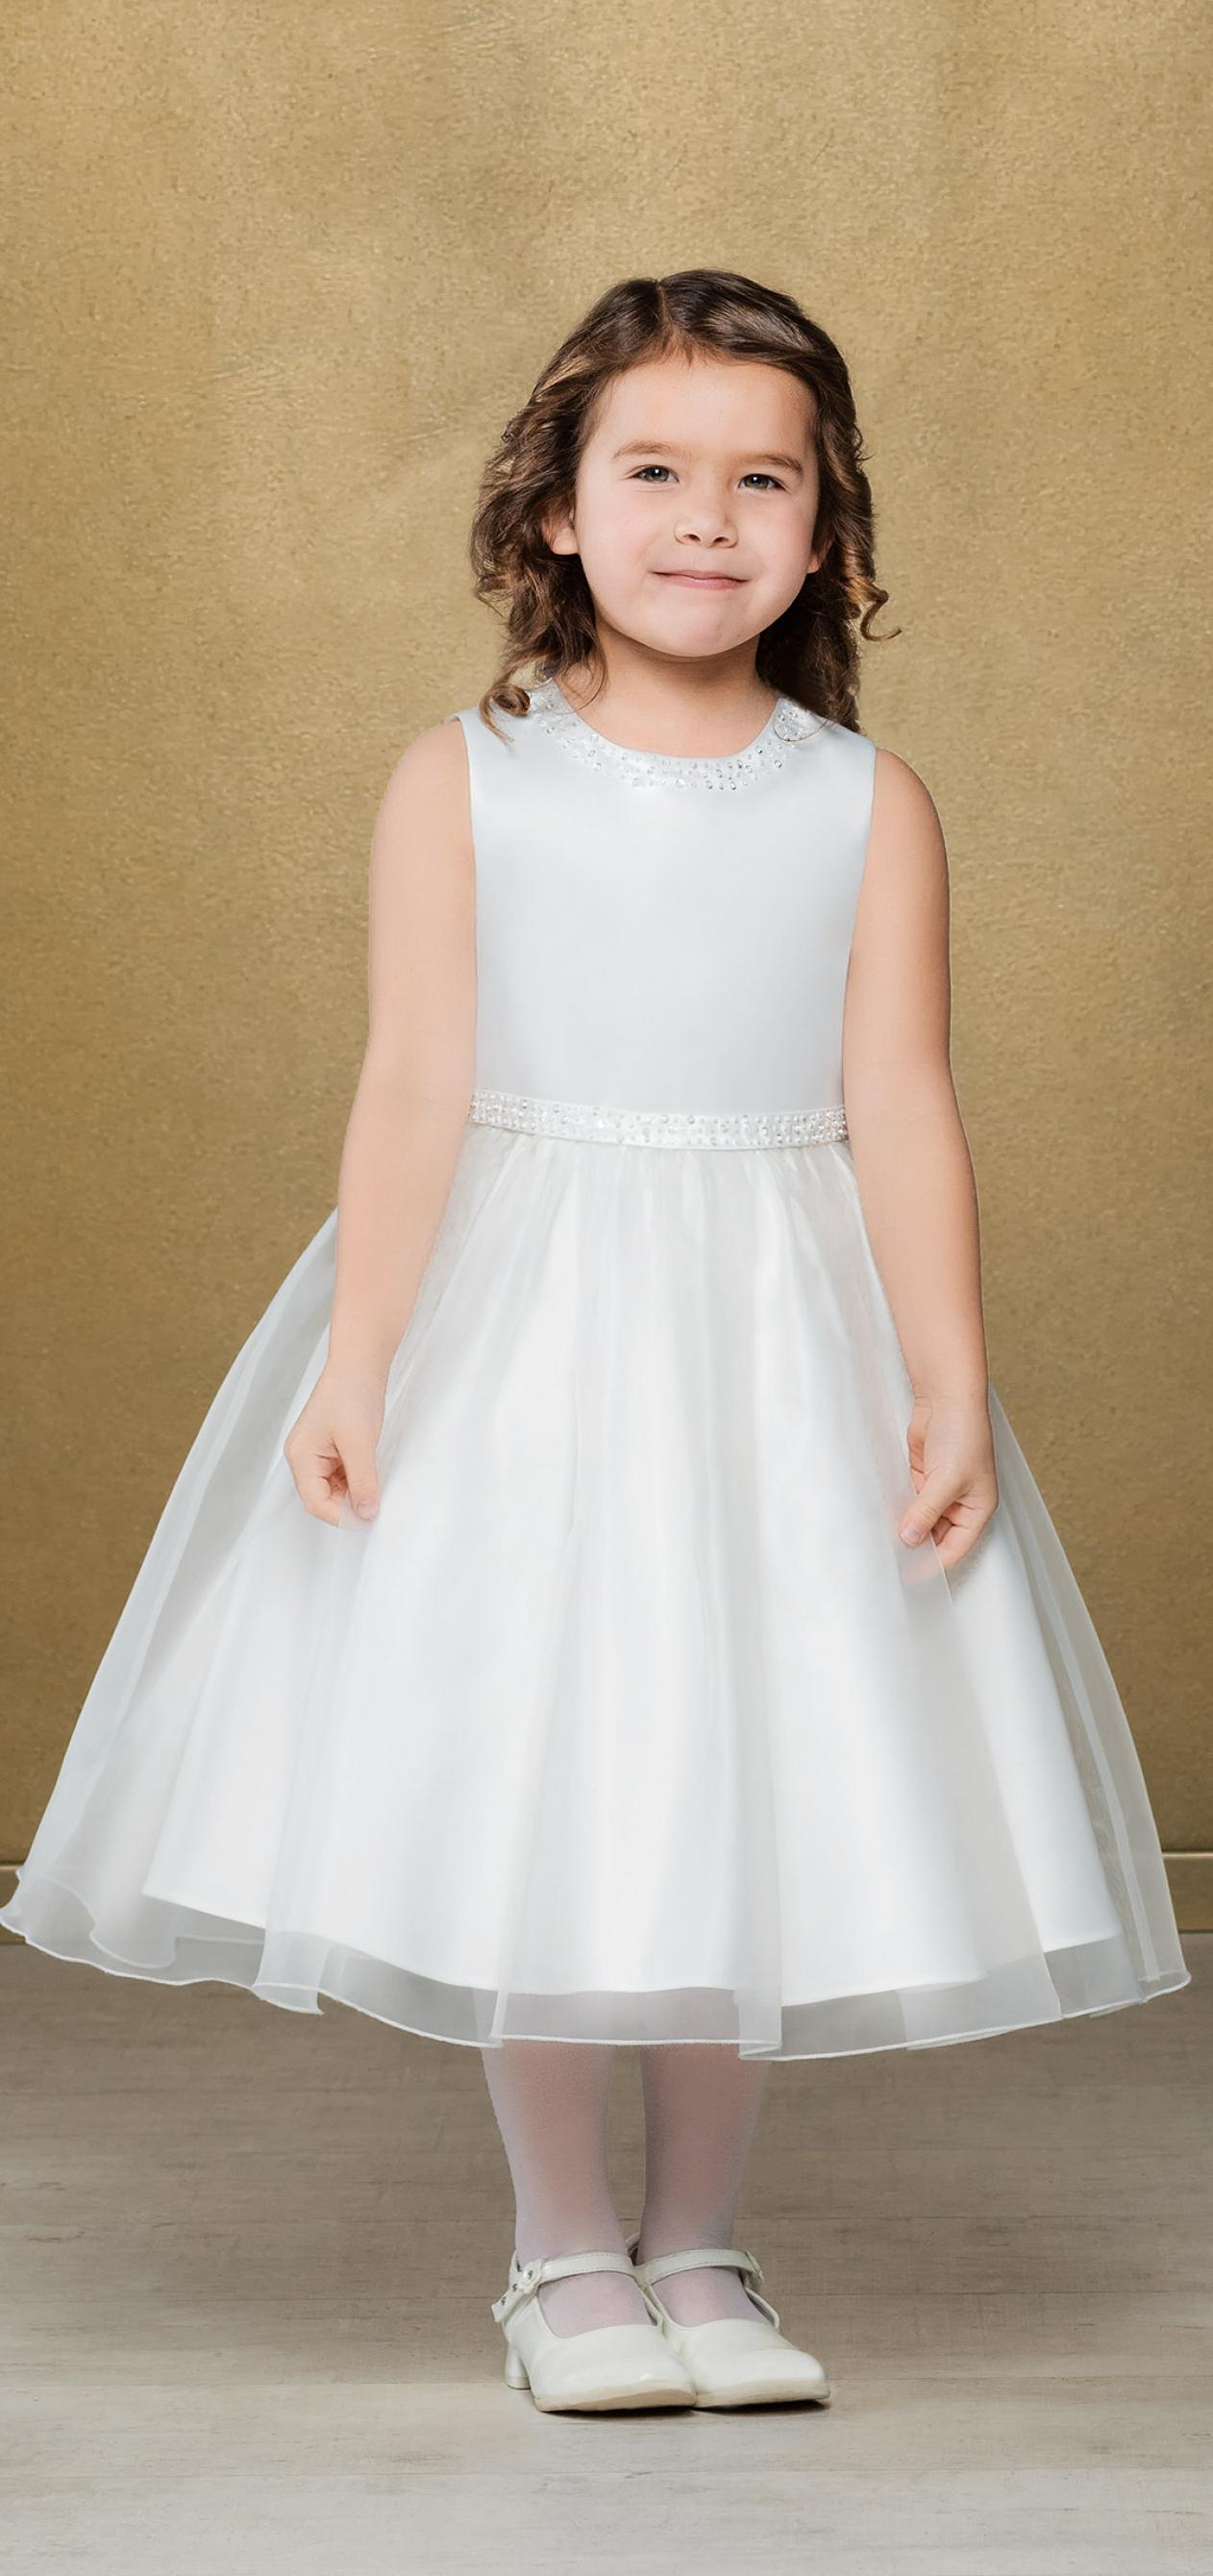 Emmerling Flower Girl Dress 91947 - Satin and organza